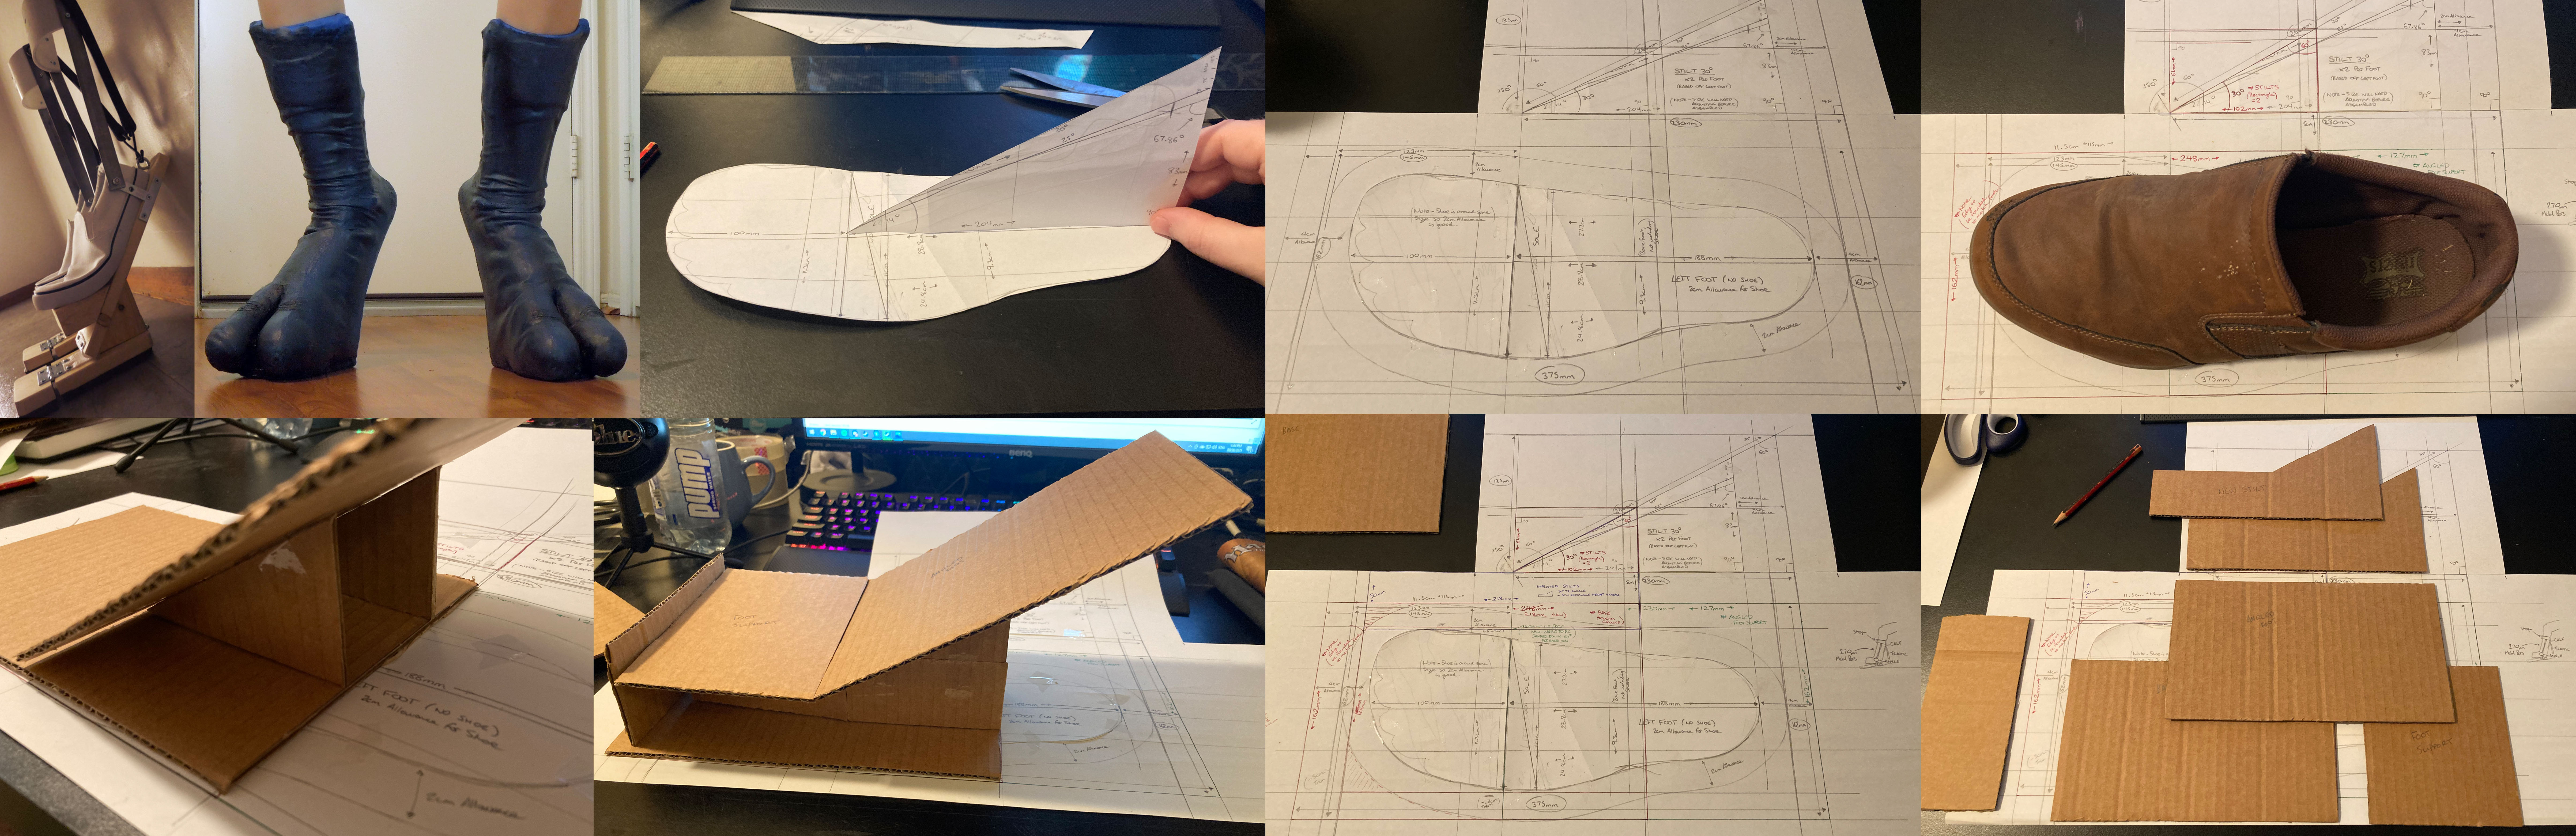 (2a) Stilt Prototype Progress - Arbiter.jpg